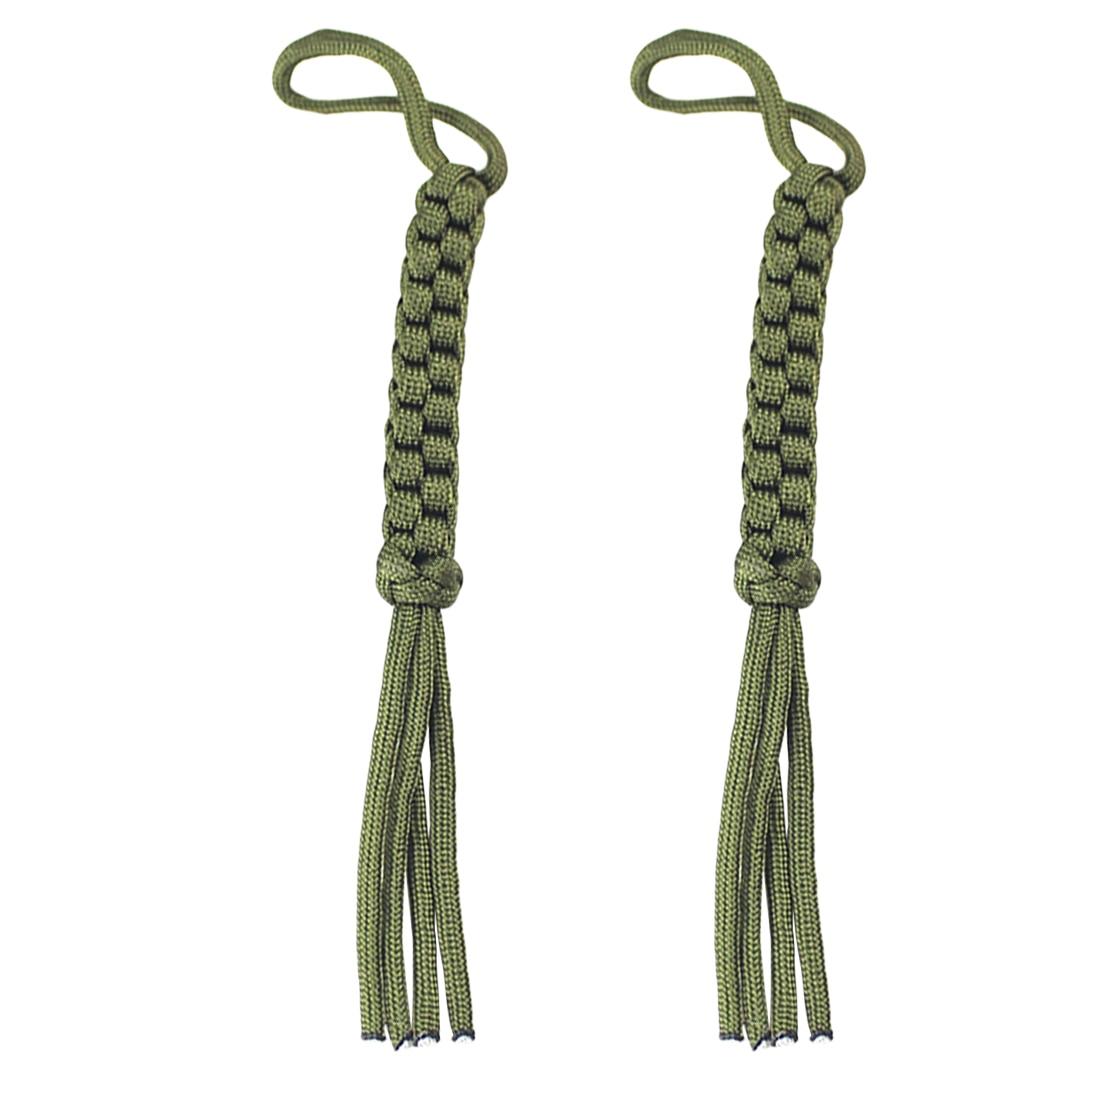 Practical 2Pcs/lot EDC Gear Corn Knot Umbrella Rope Nylon Chain Rope Tool Ornaments Falling Knife Knot Keychain DIY Tools